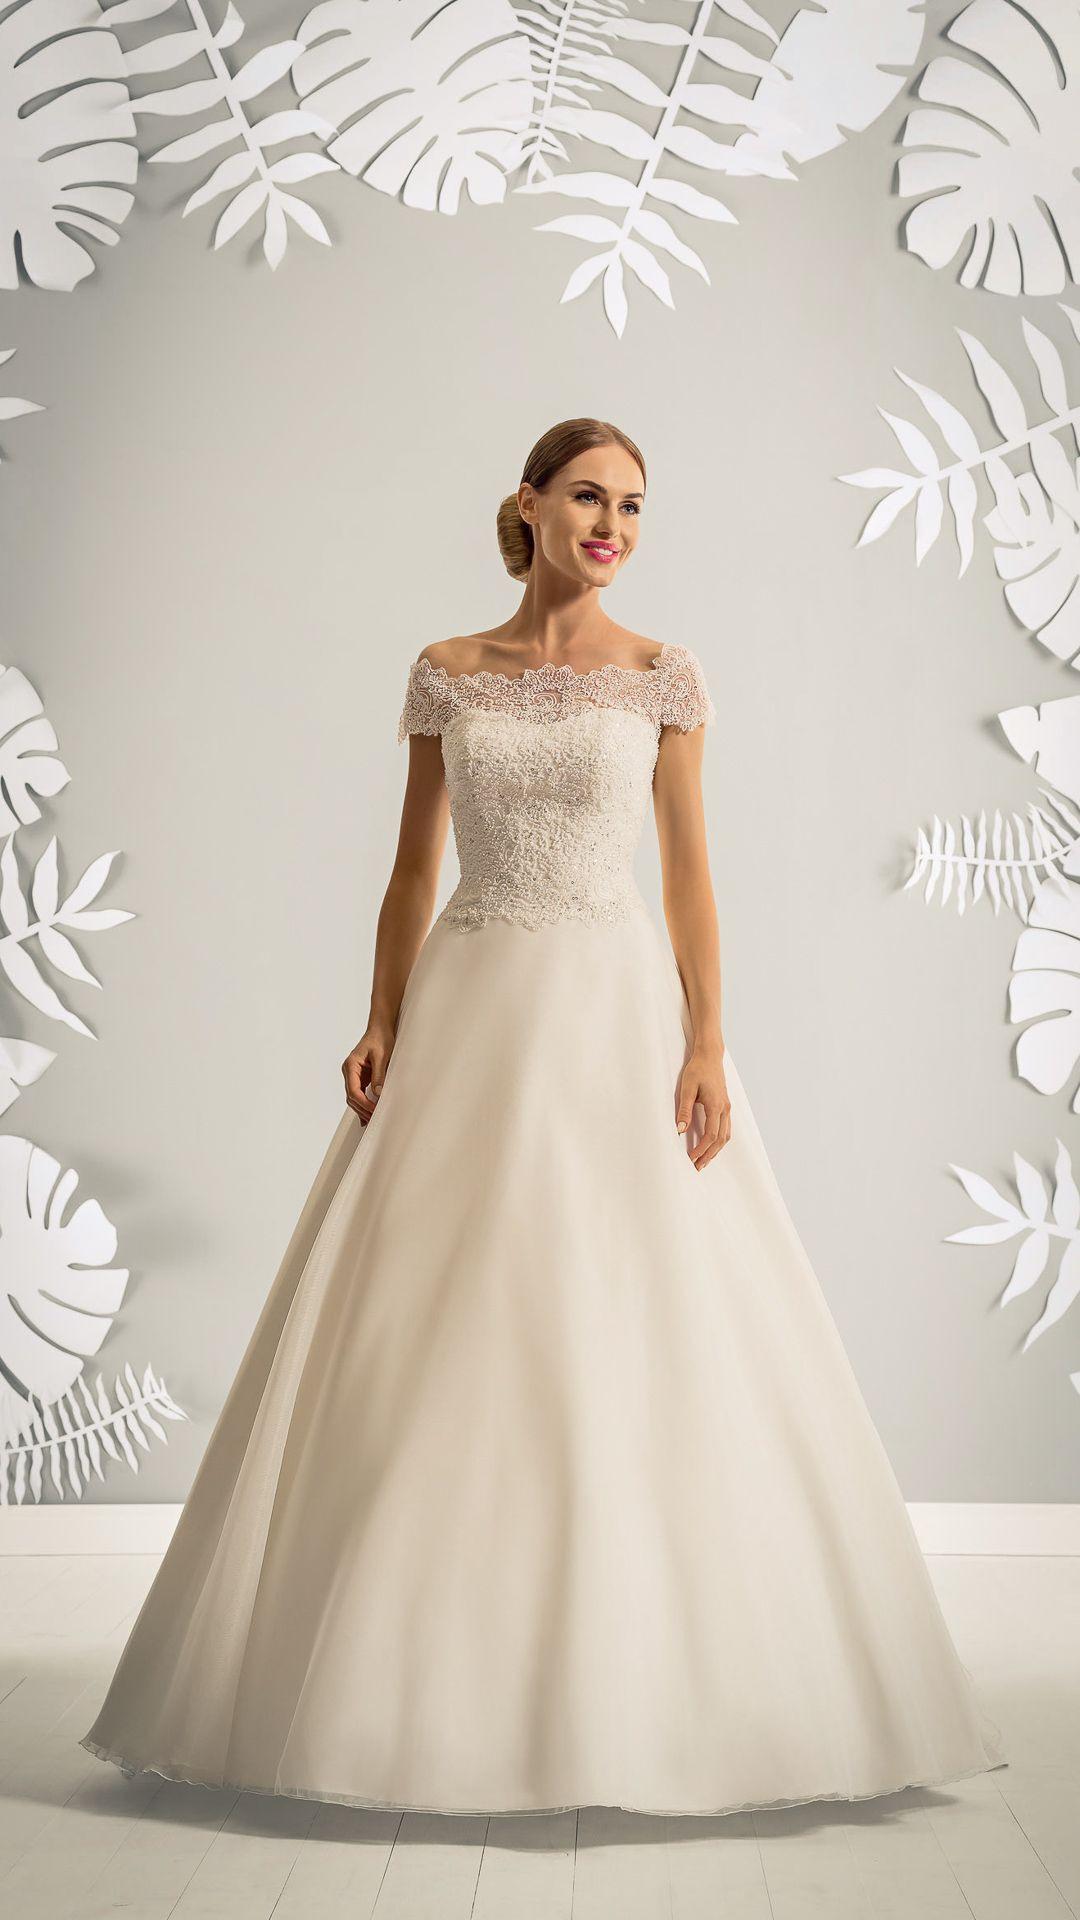 Hochzeitskleidmodedepolelizabethmodell3437T  Kleid